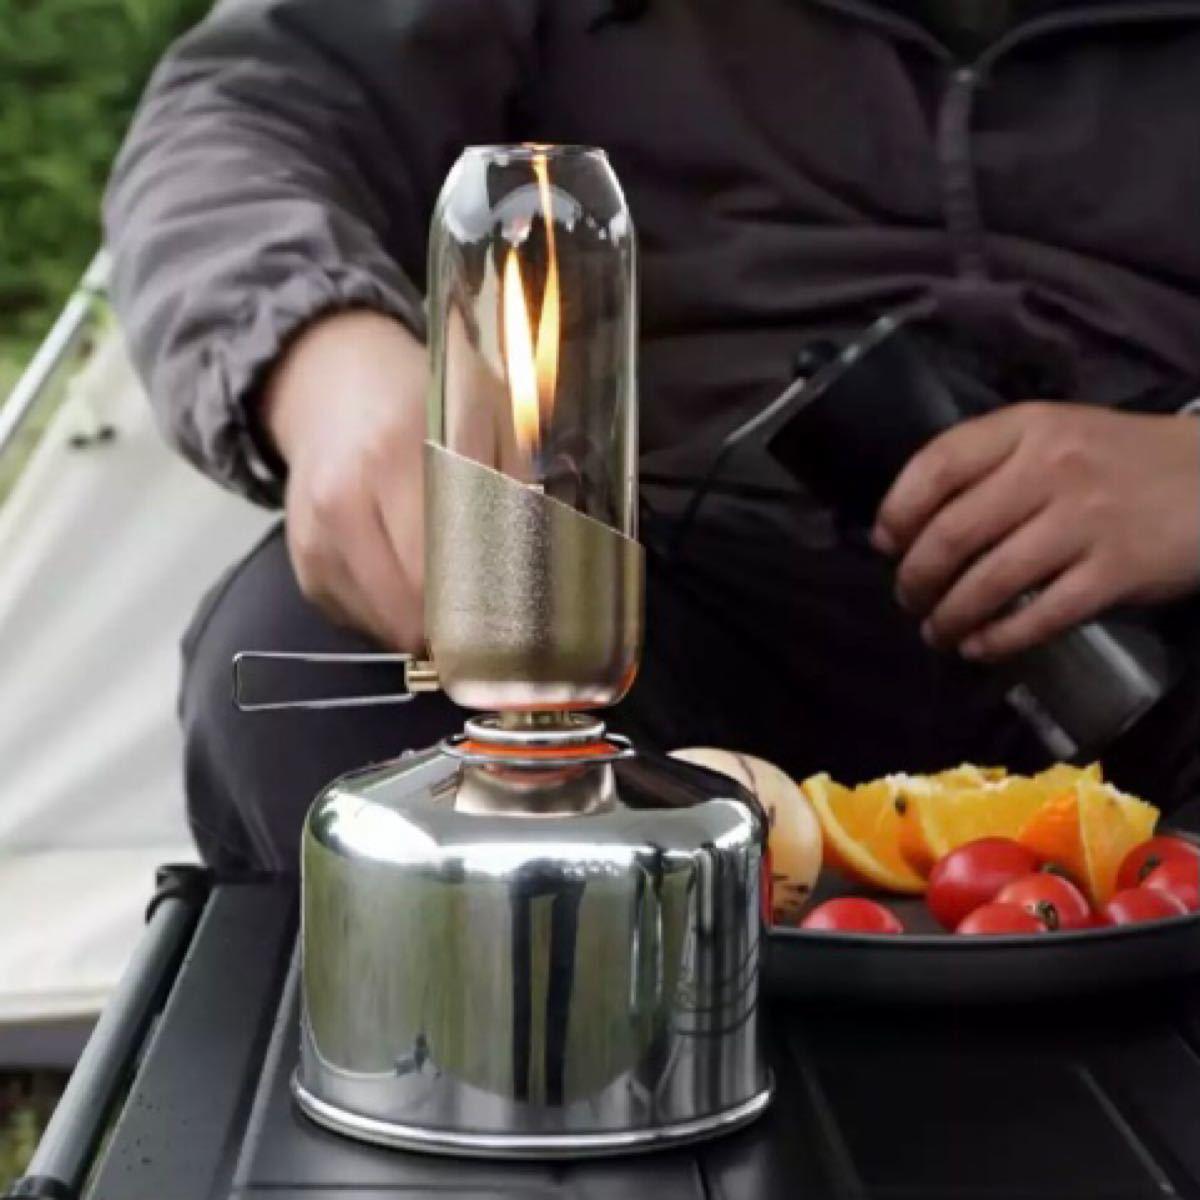 OD缶カバー シルバー 230用 ステンレス 金属 真鍮 おしゃれ シンプル